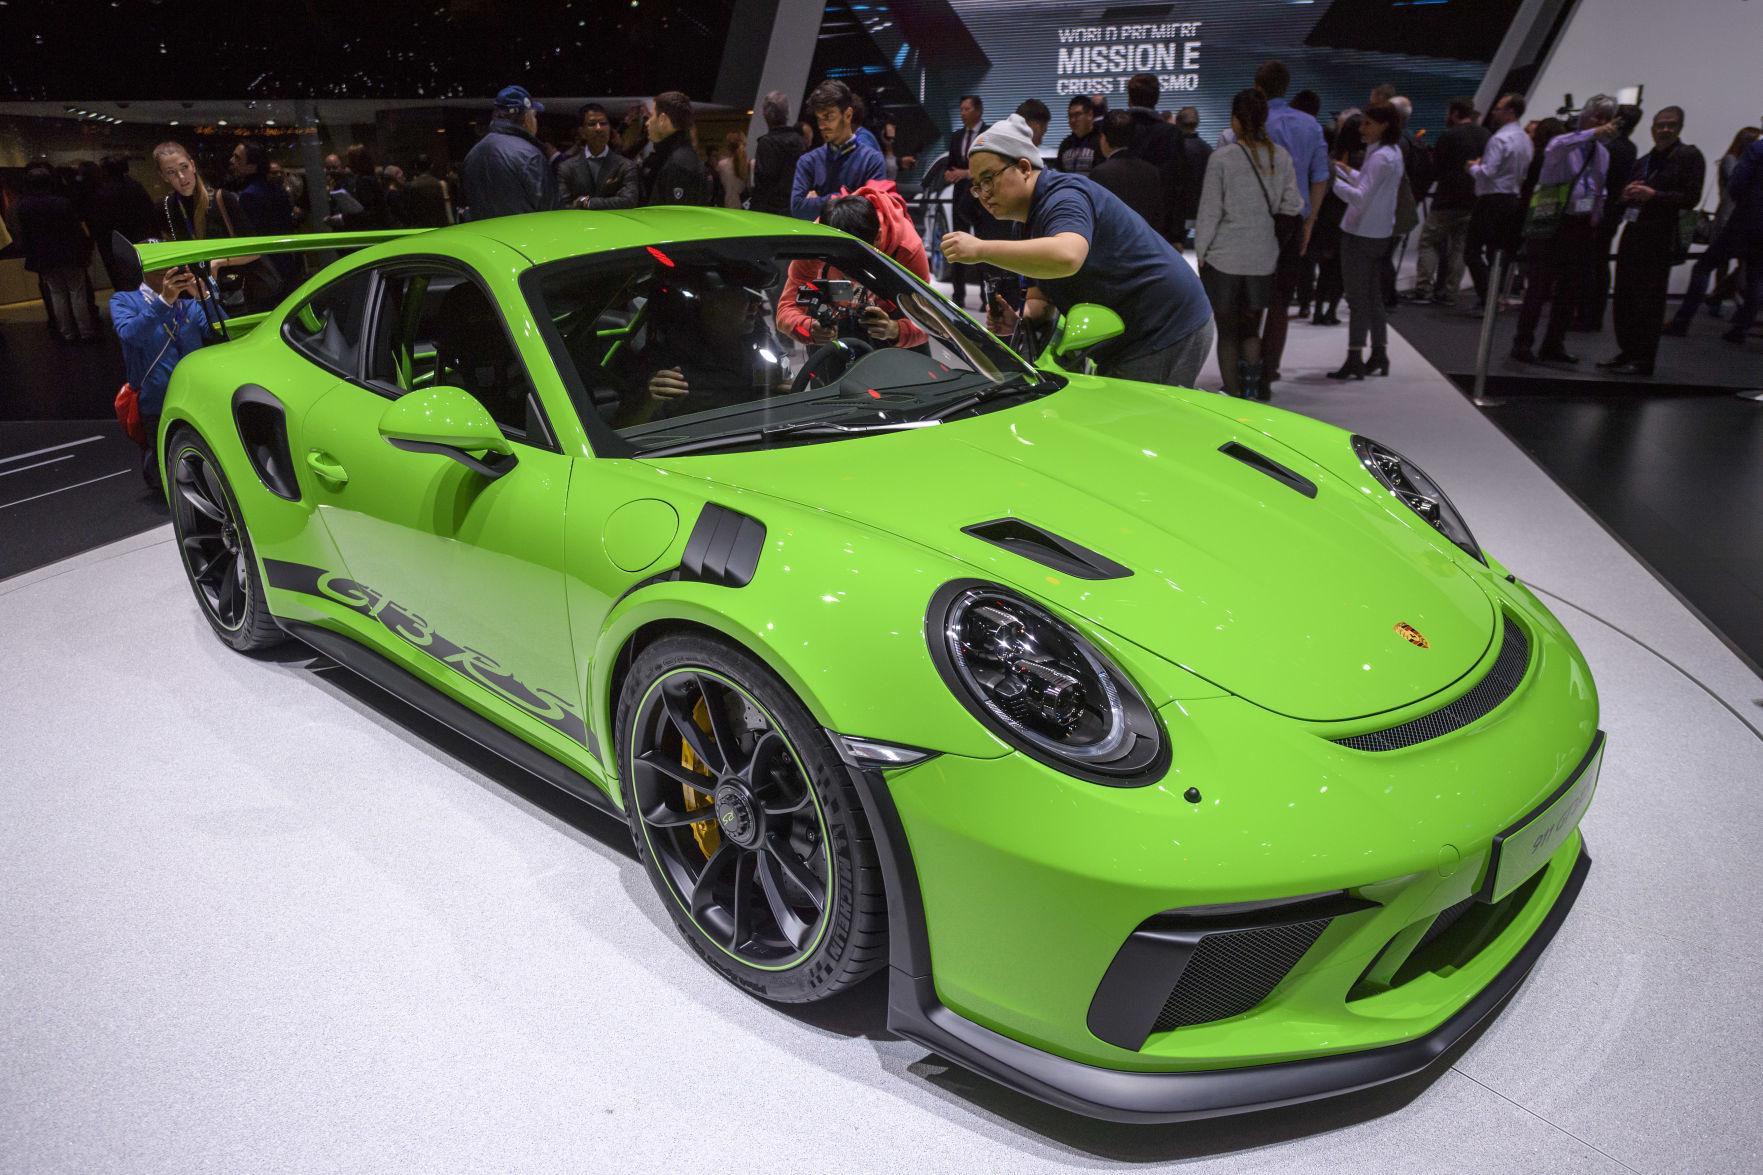 Nice High End Sports Cars Gleam At Geneva Auto Show. Bring Money